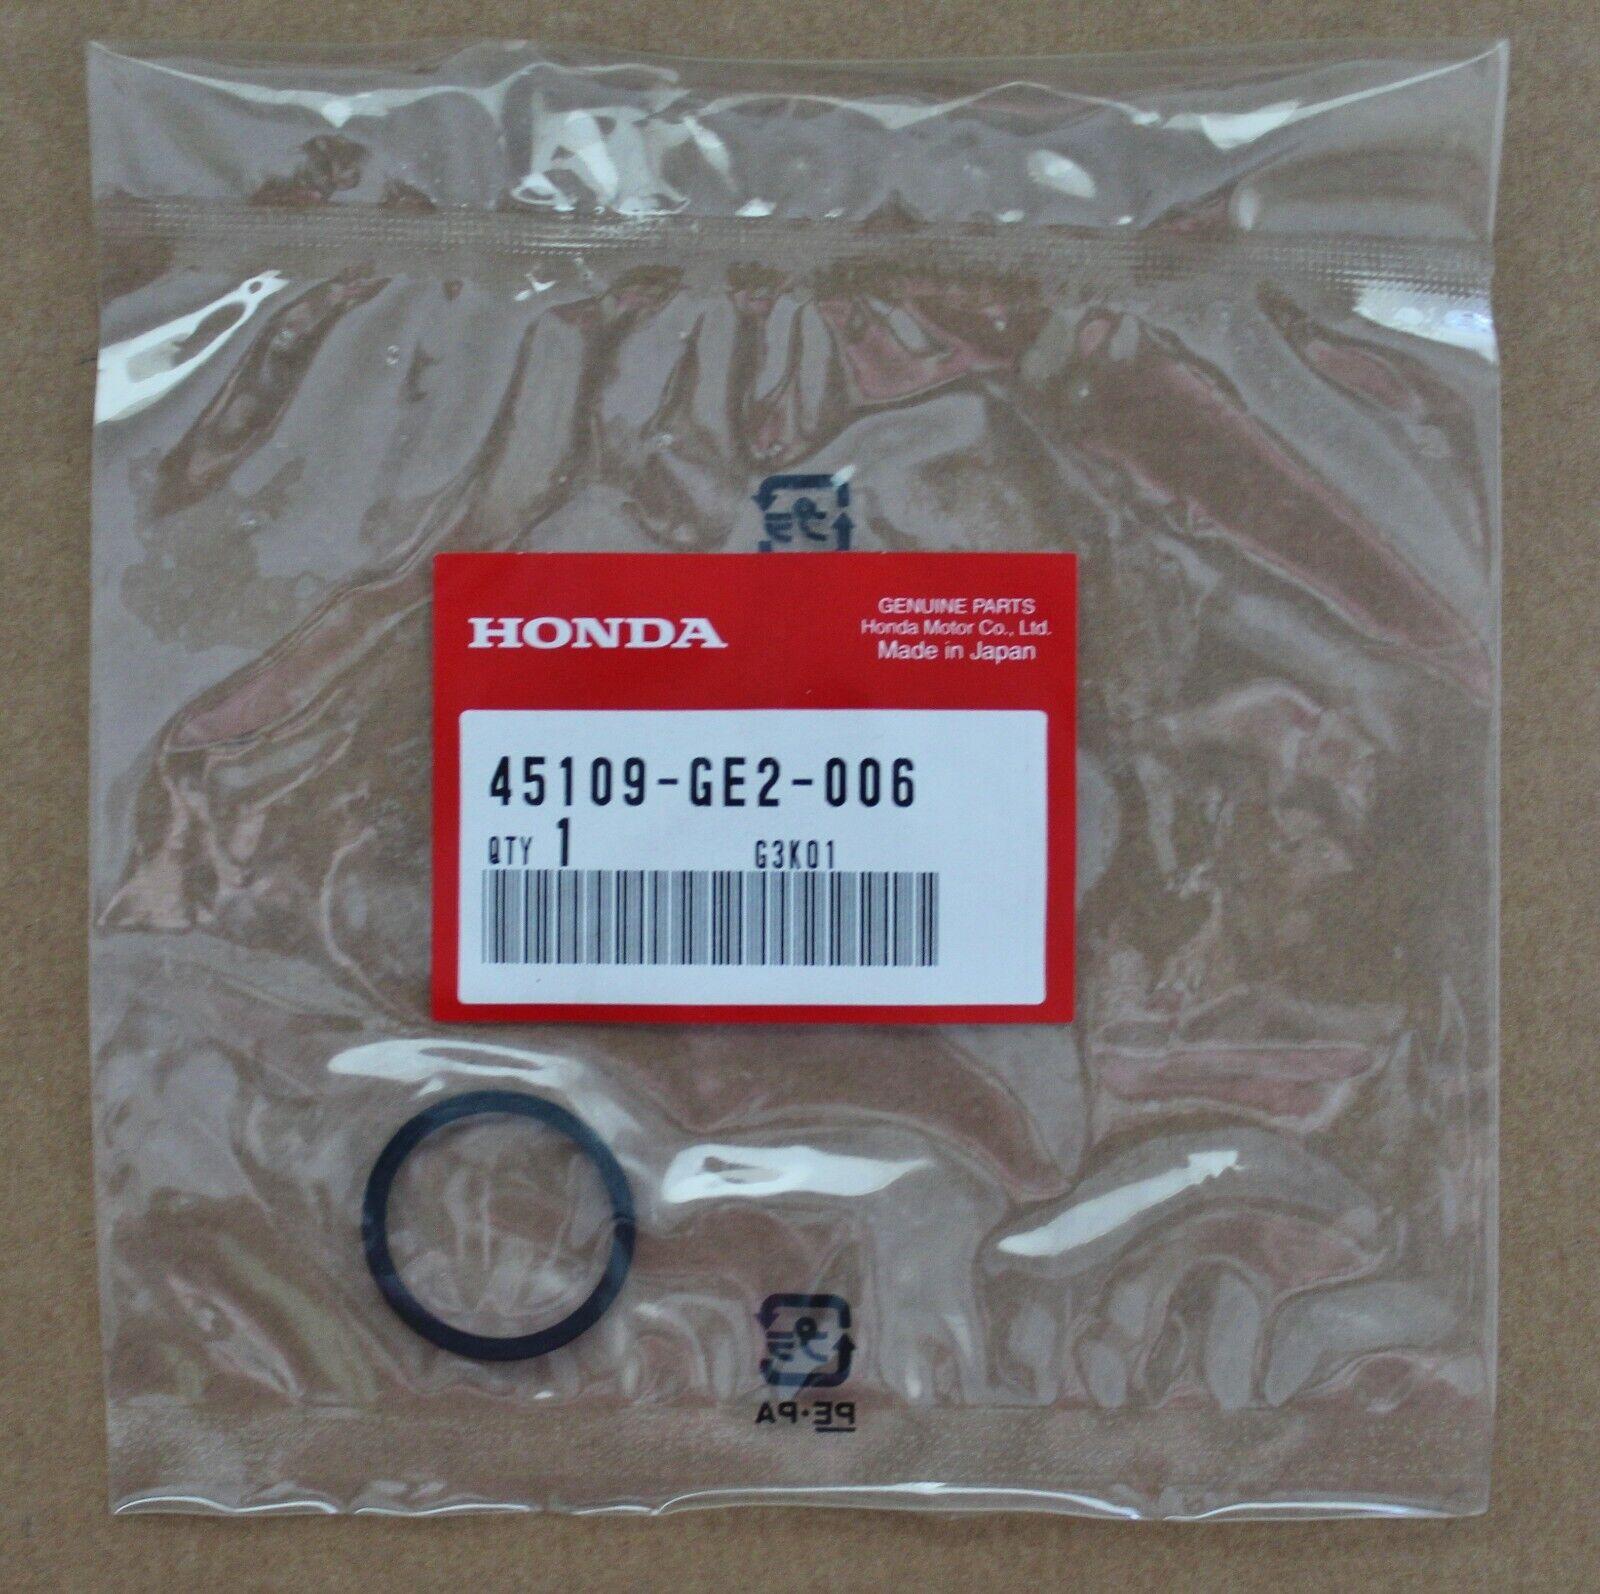 PISTON GENUINE Honda NOS 45209-GE2-006 SEAL